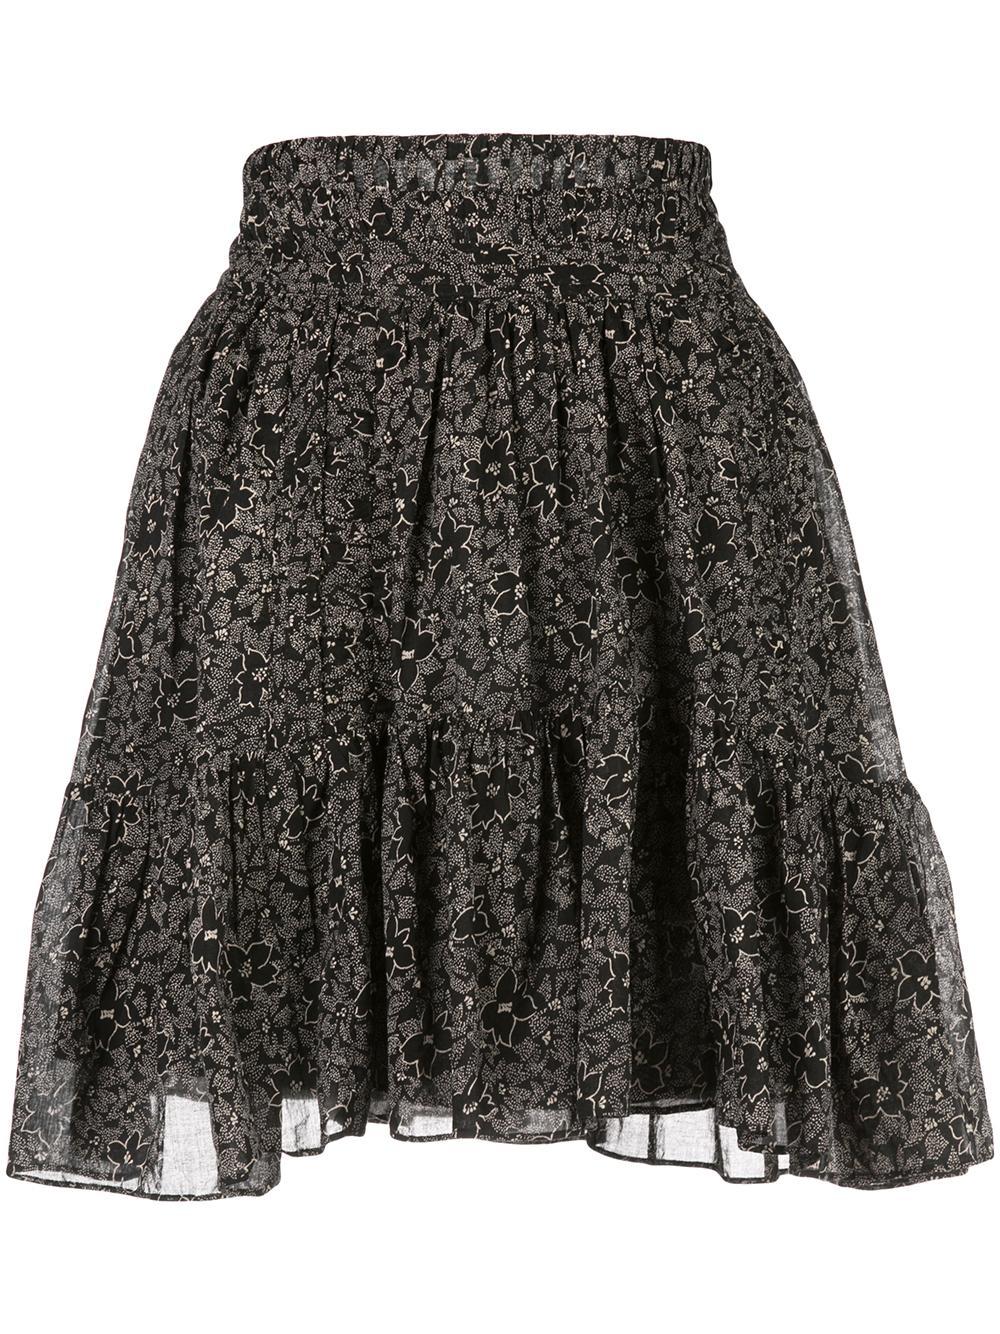 Printed Cotton Short Skirt